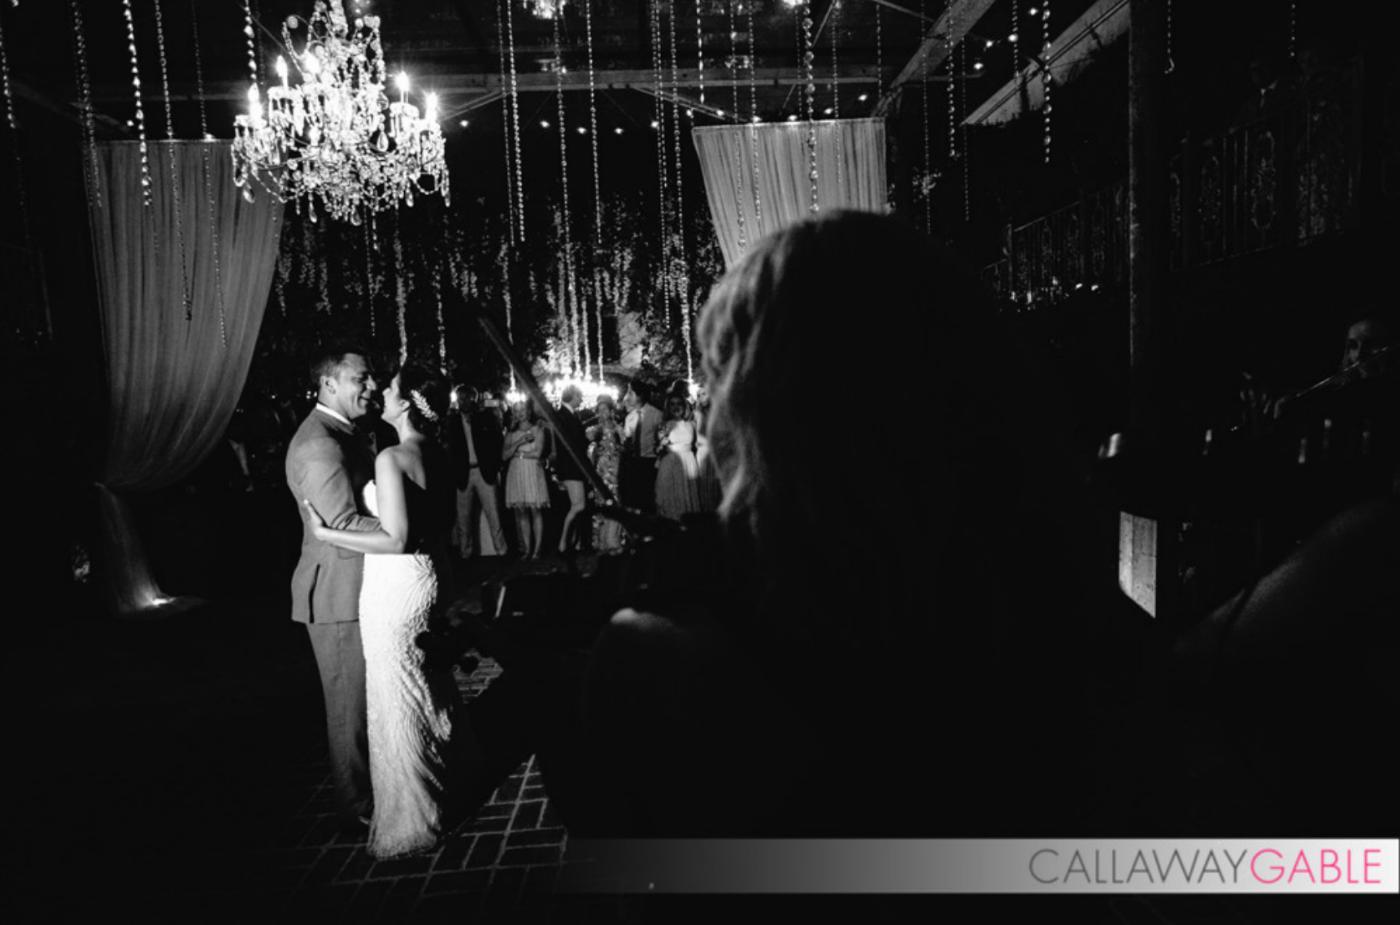 los-angeles-wedding-music-ceremony-first-dance-string-quartet-violin-viola-cello-orange-county-maui-2.png